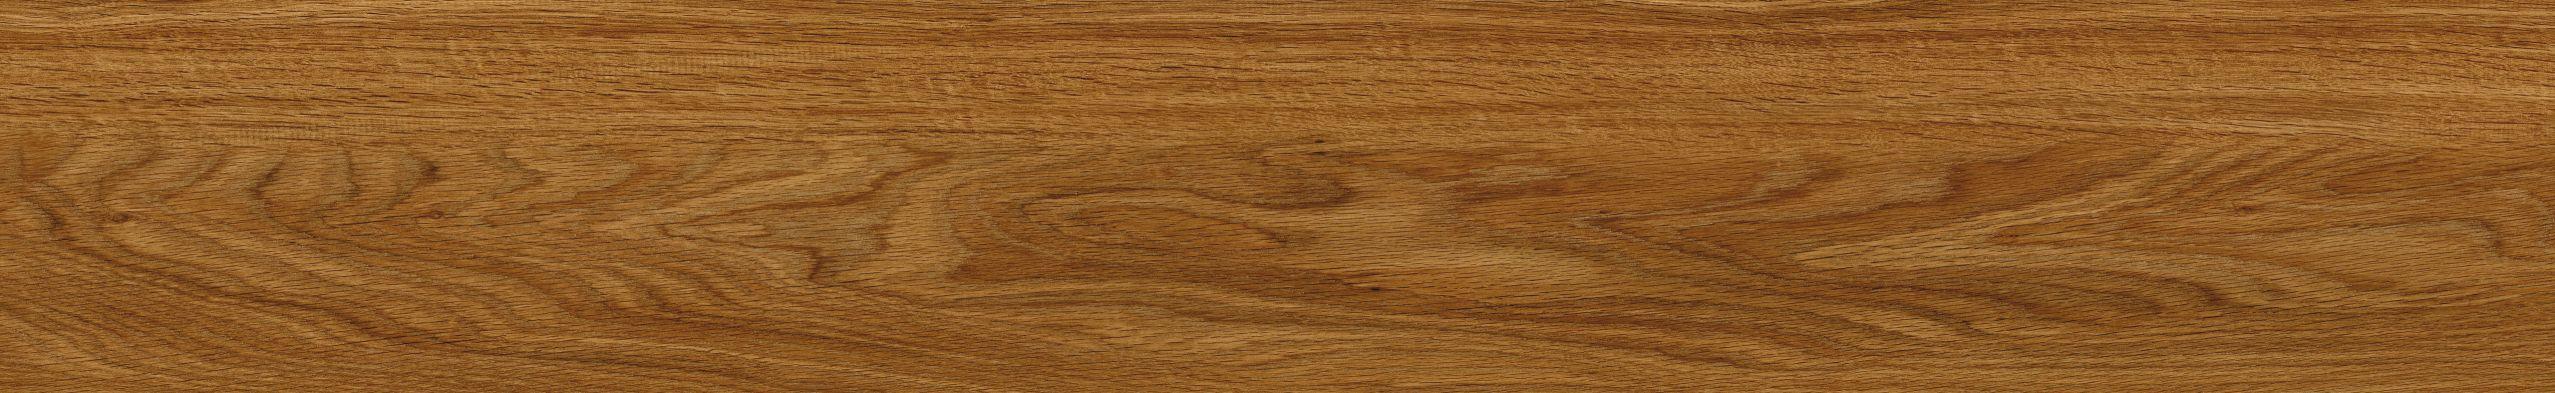 Panele winylowe LVT modulari ® WOOD DRYBACK 19,6 x 132 cm 24276